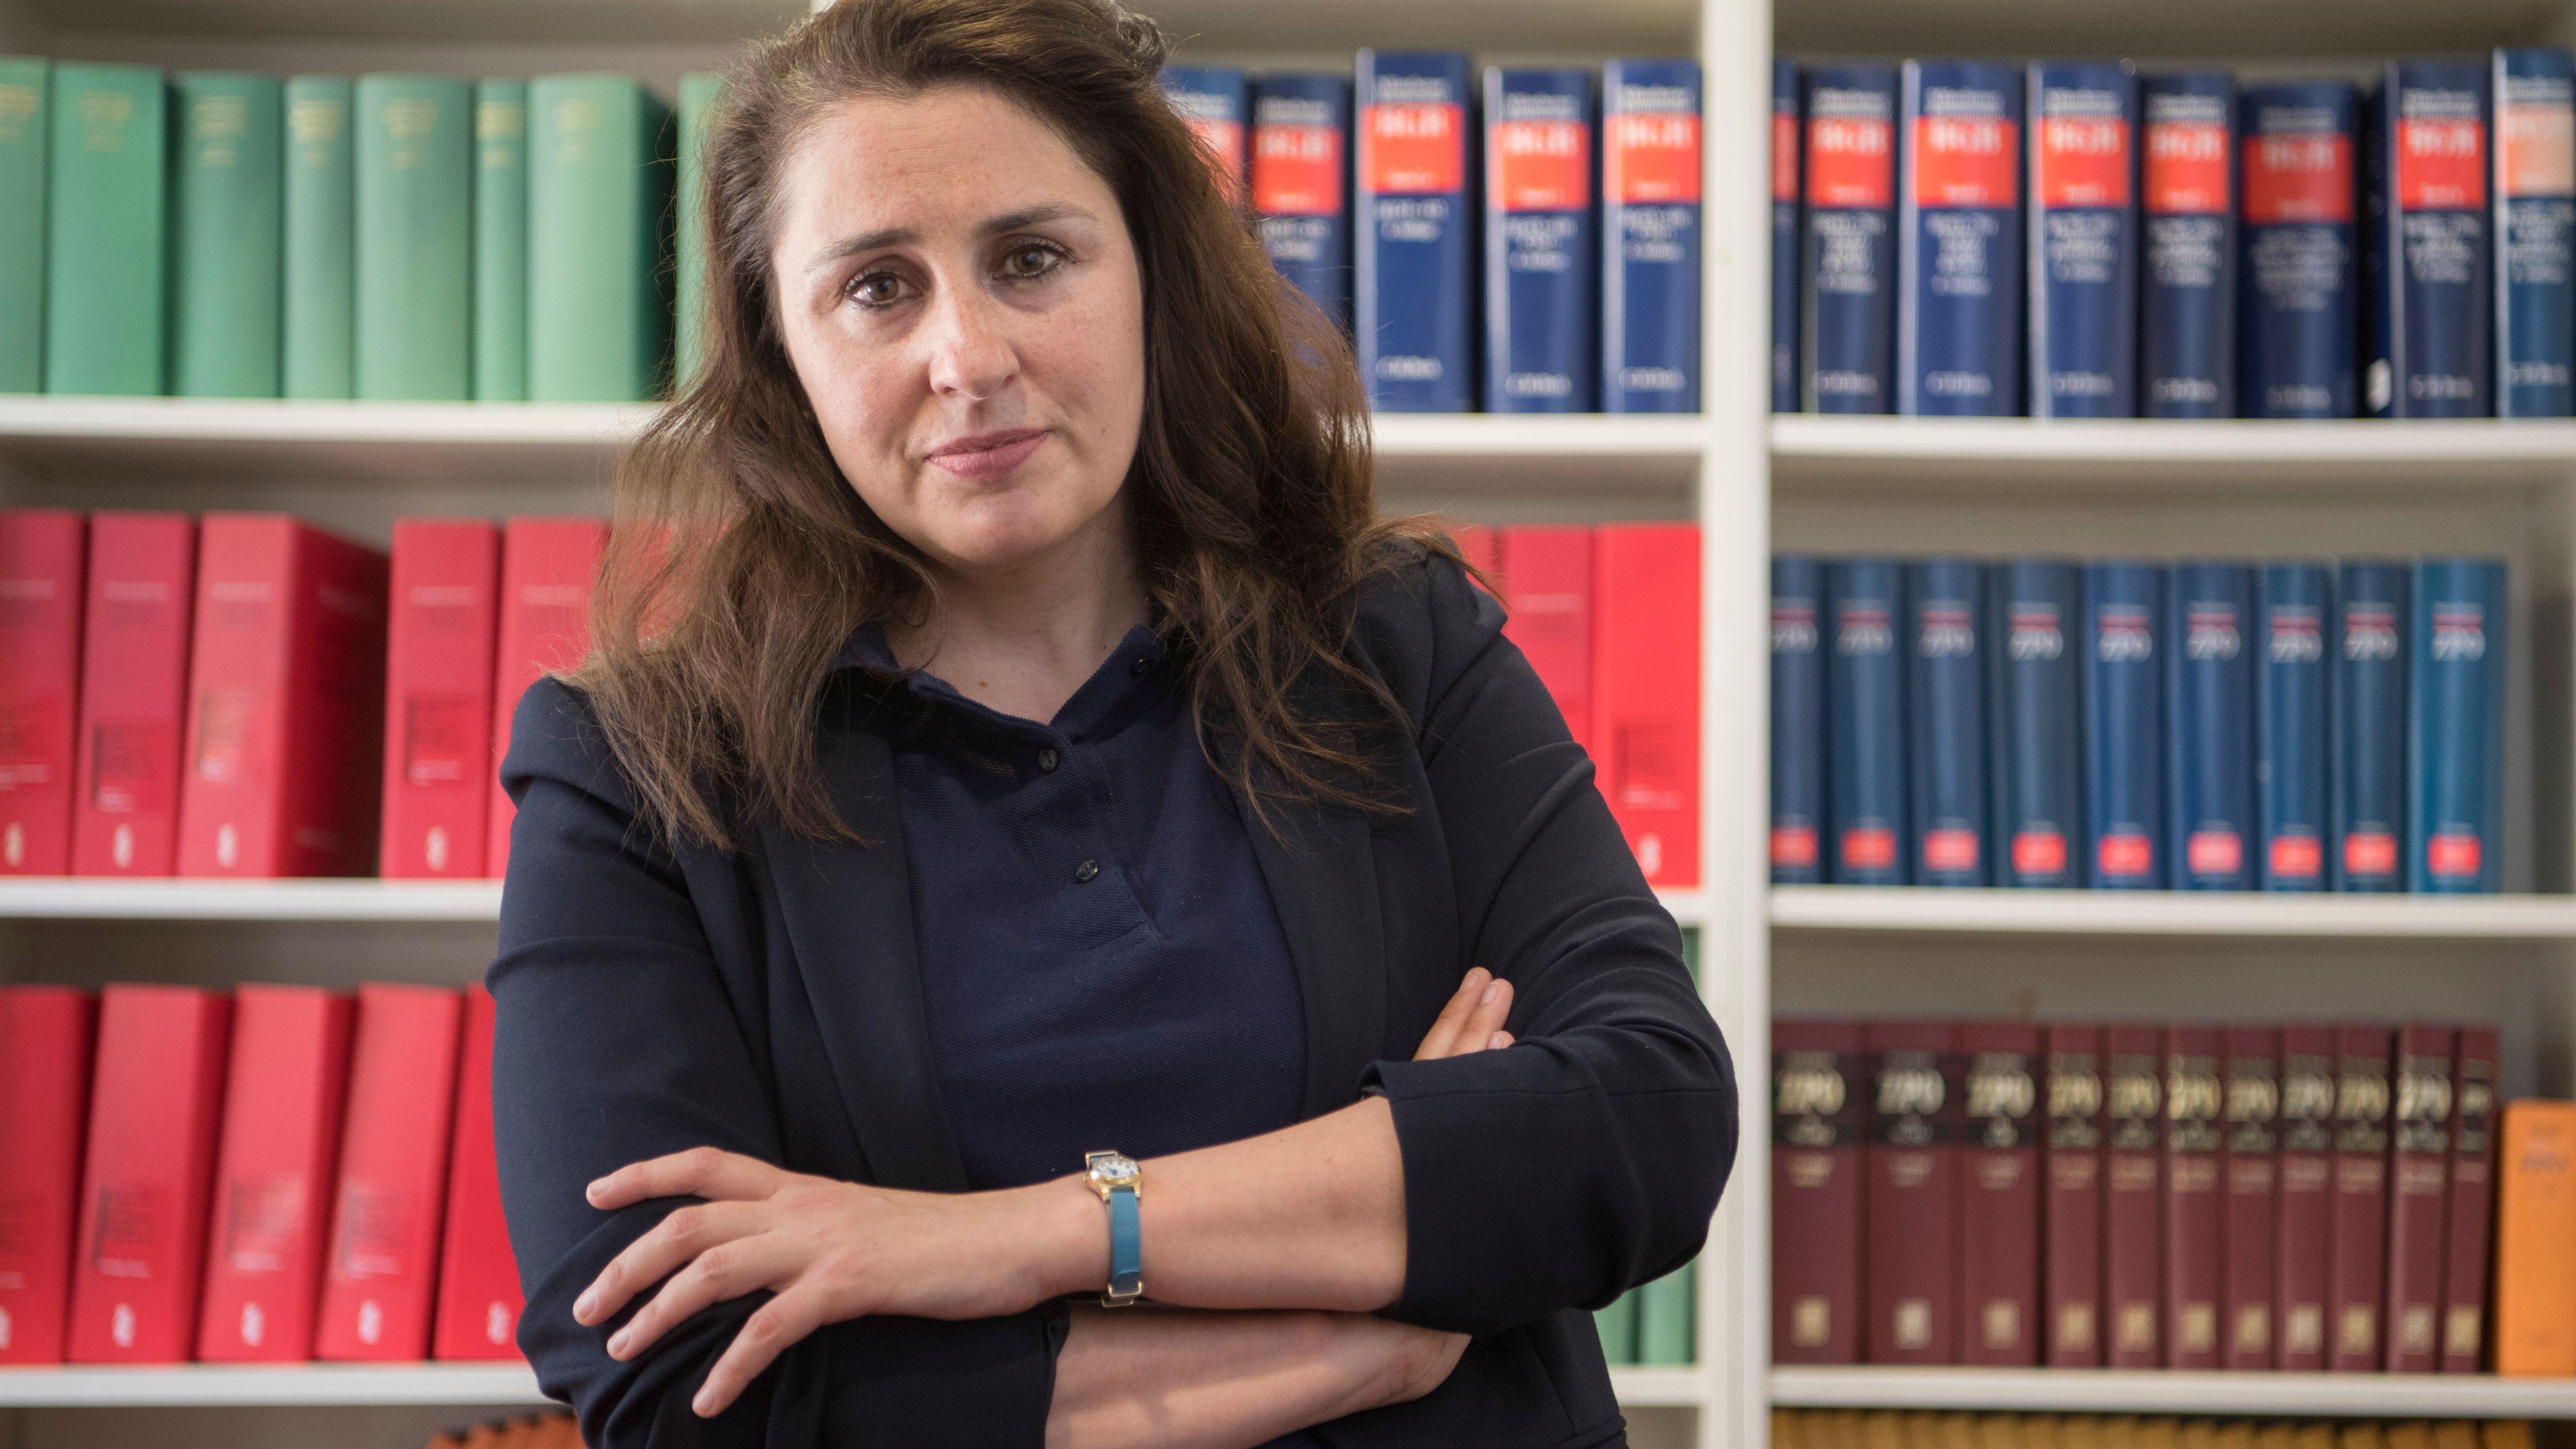 Seda Basay-Yildiz, Rechtsanwältin, steht in ihrem Büro.